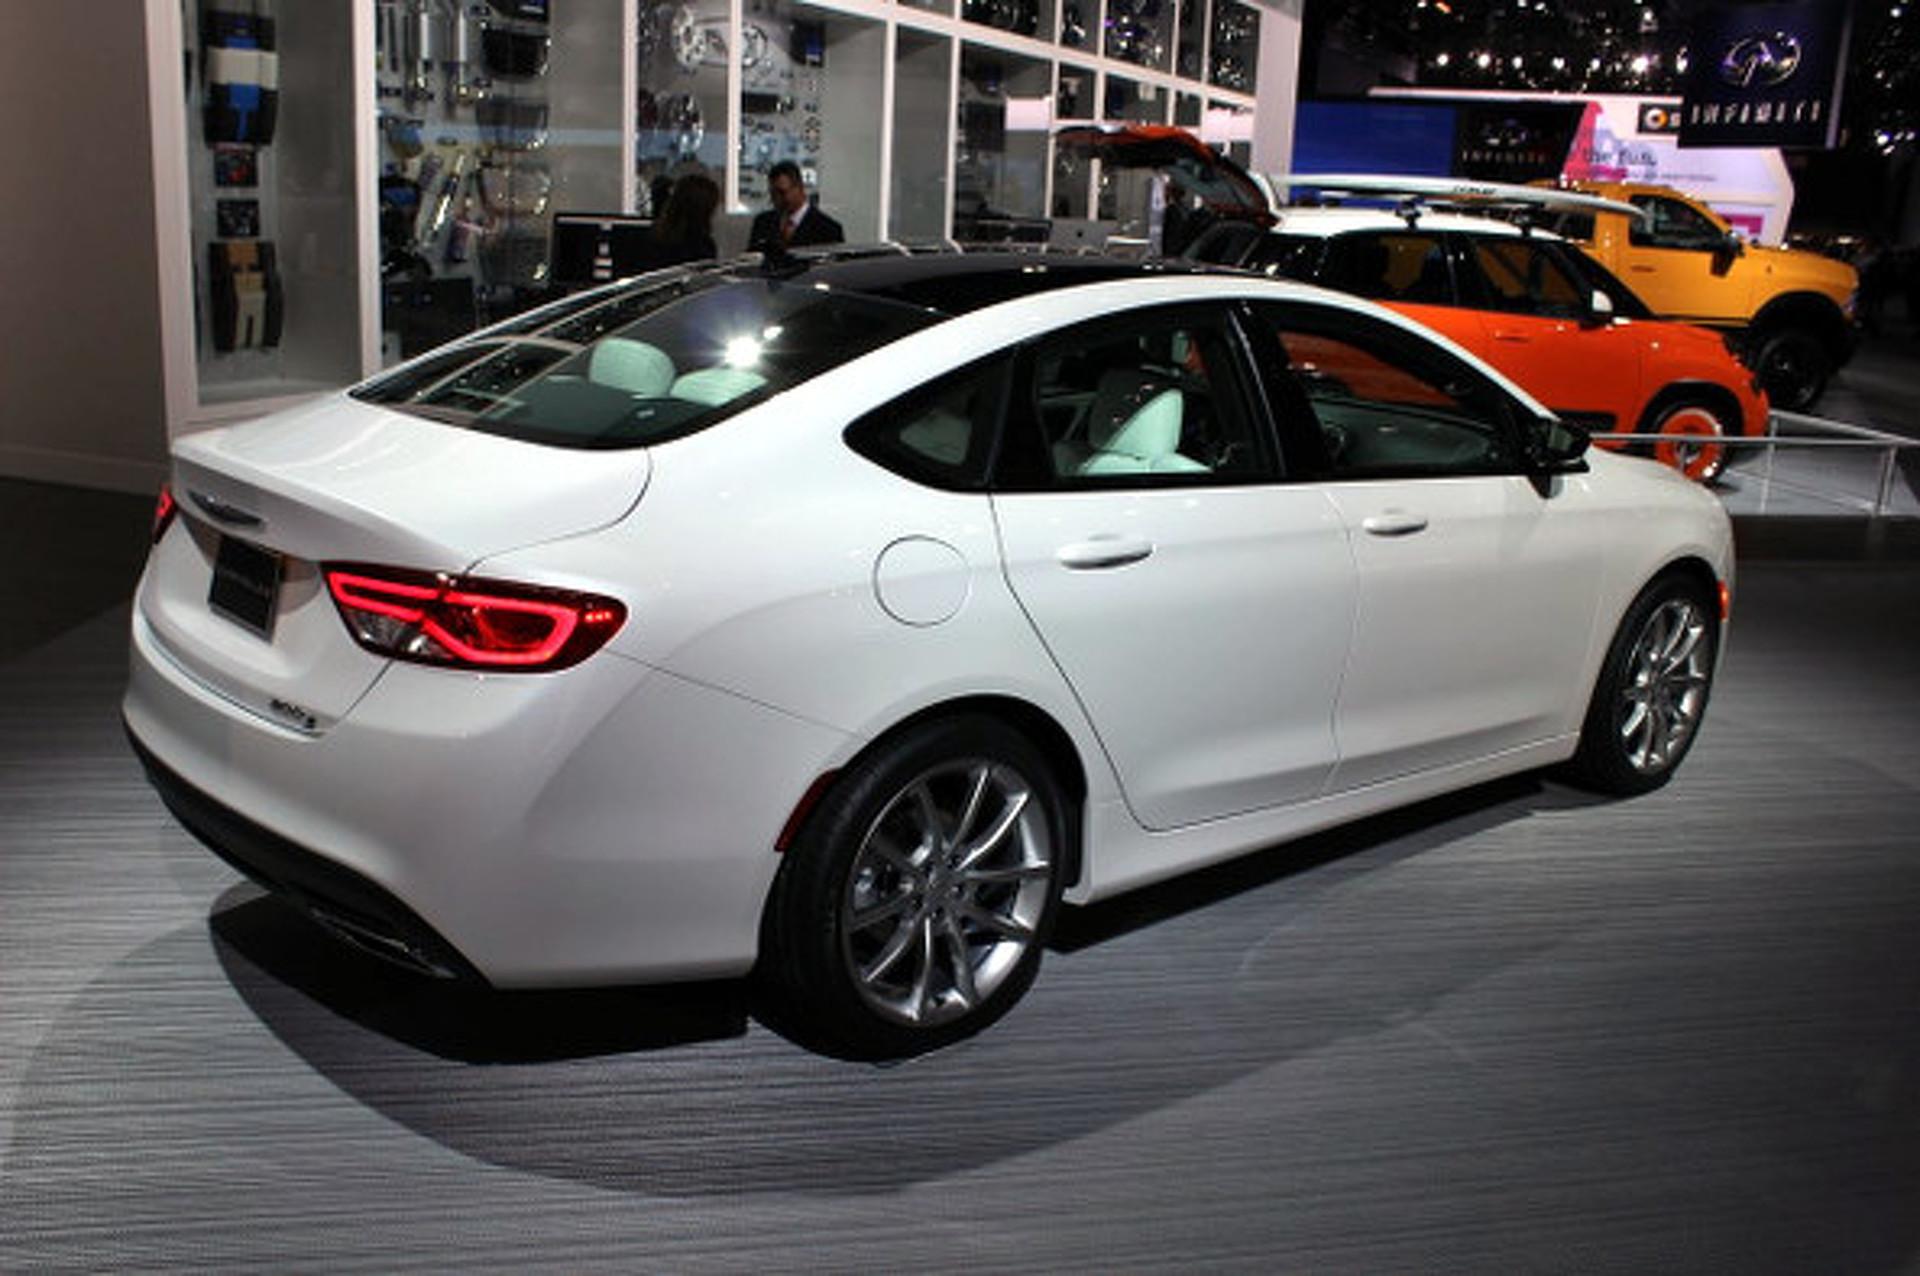 Chrysler 200 Shows Off New Looks, New Power in Detroit